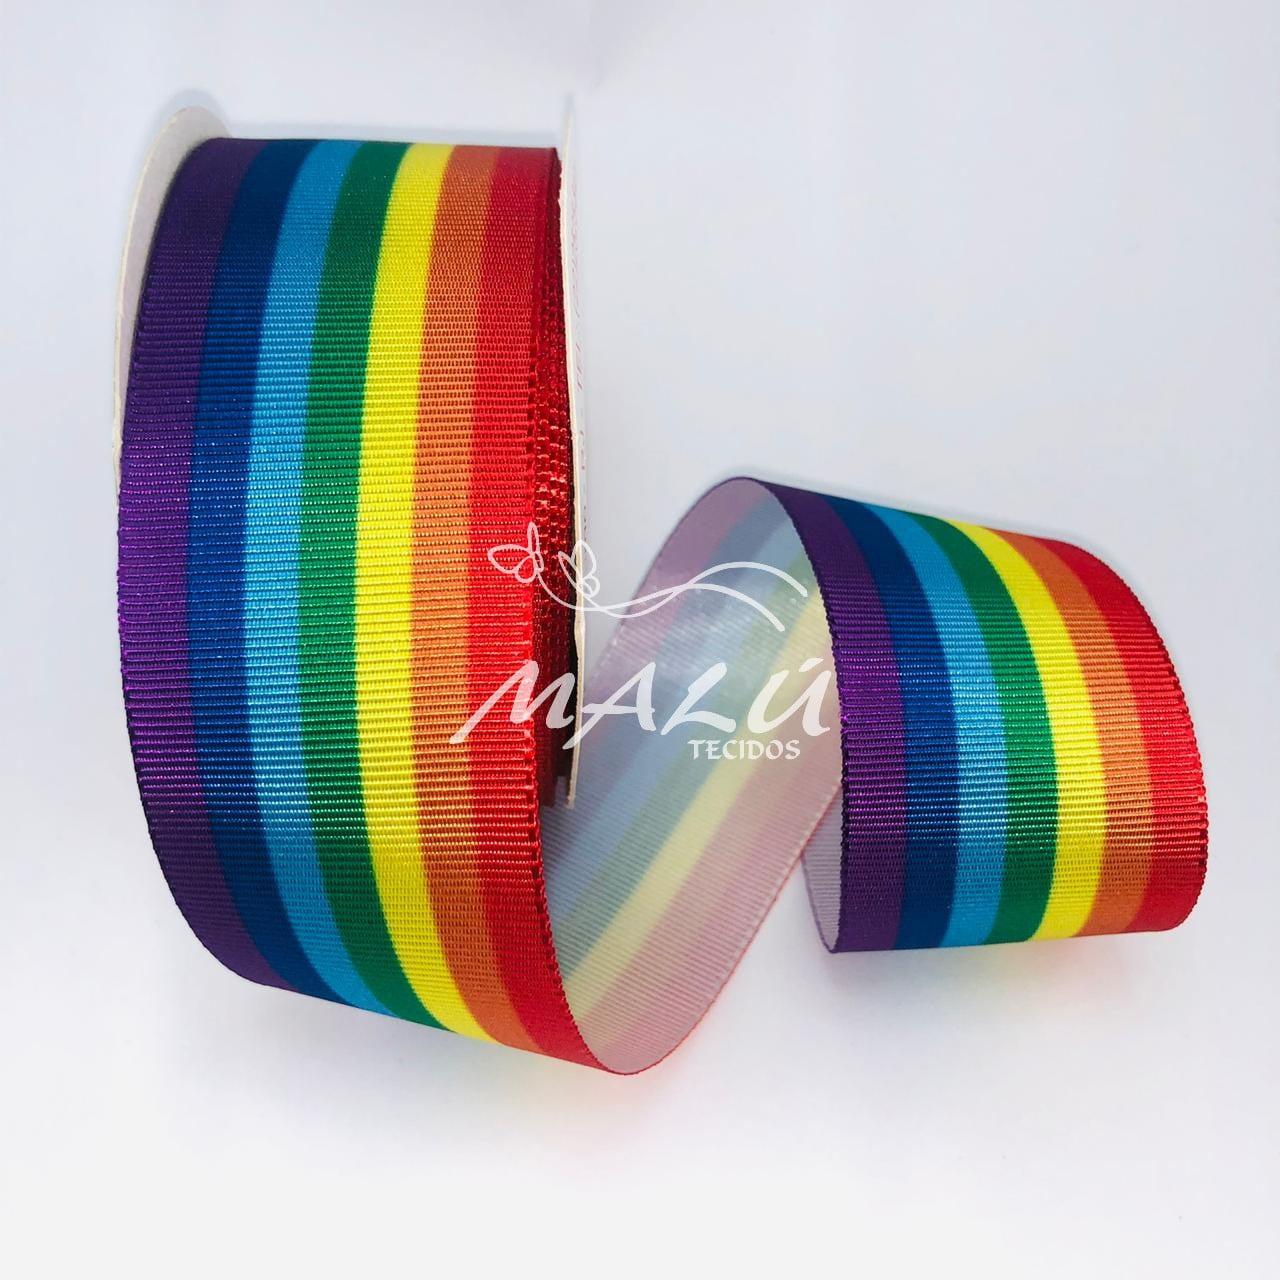 Fita Gorgurão Estampada Orgulho LGBT N9 10mts